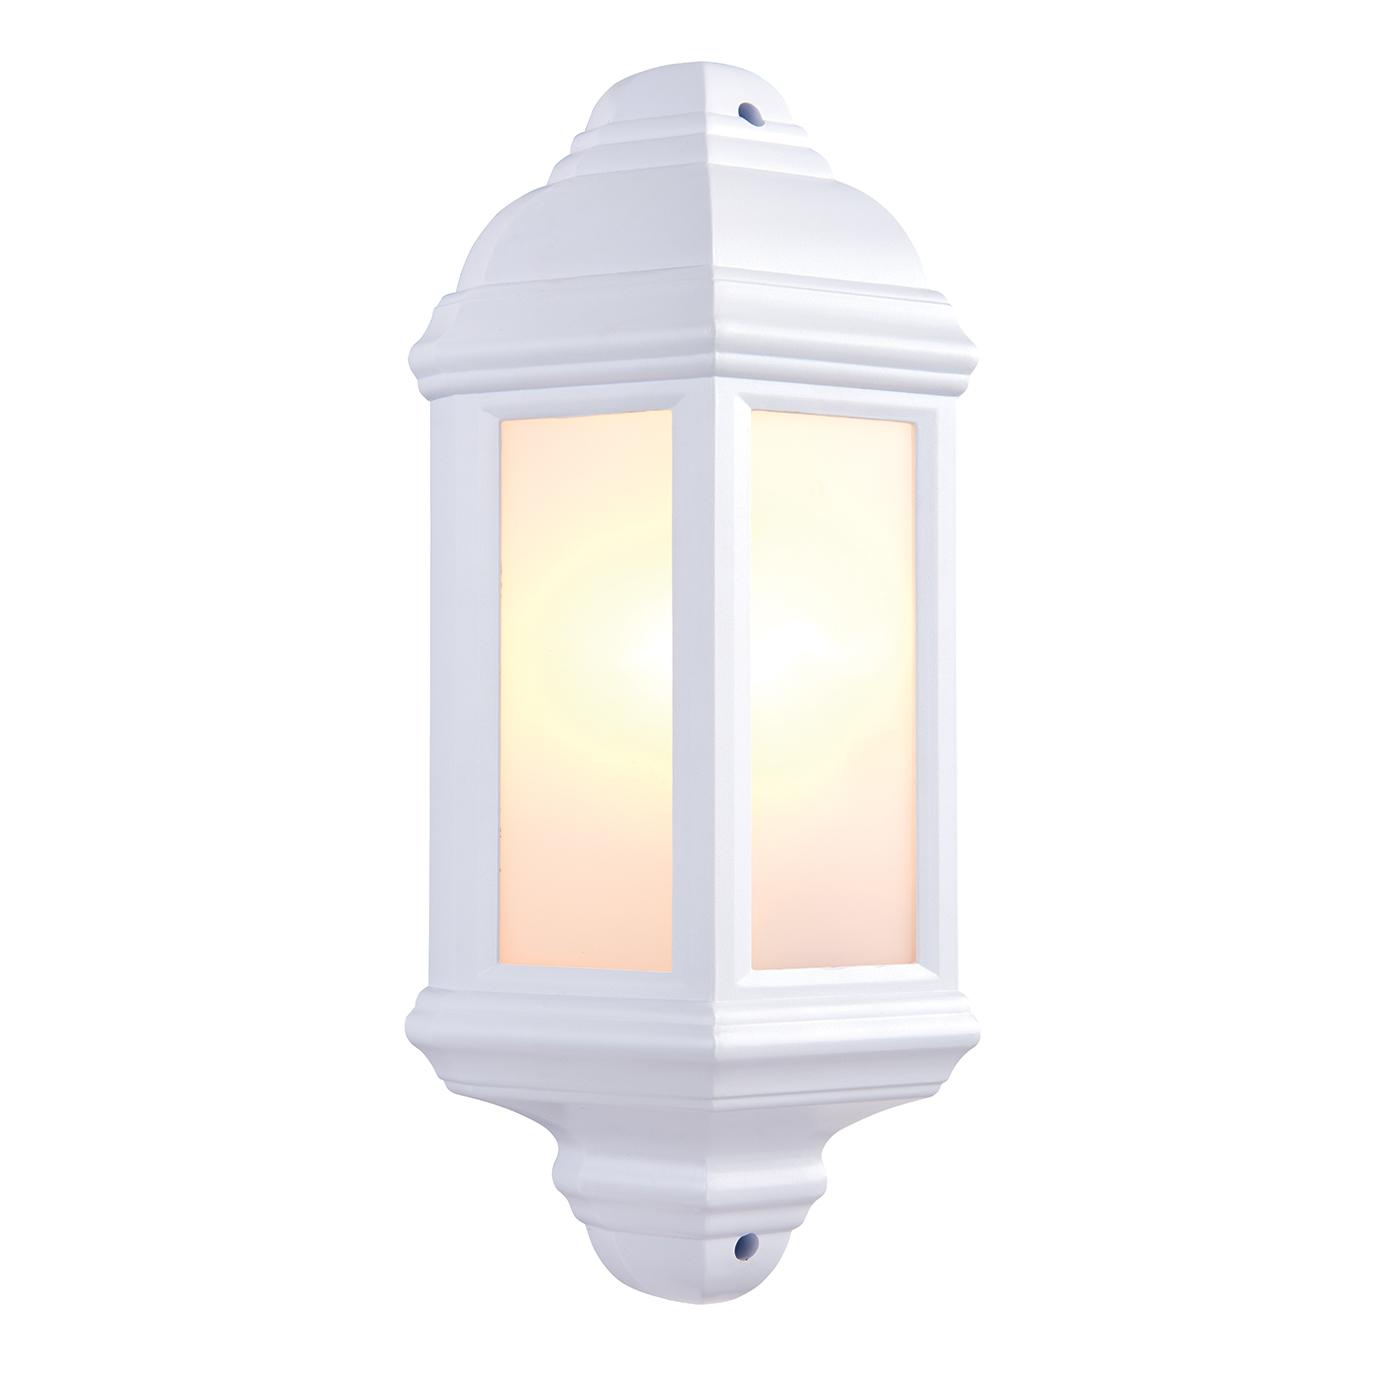 Outdoor Wall Light Accessories: Endon Halbury Outdoor Wall Light IP44 60W Matt White